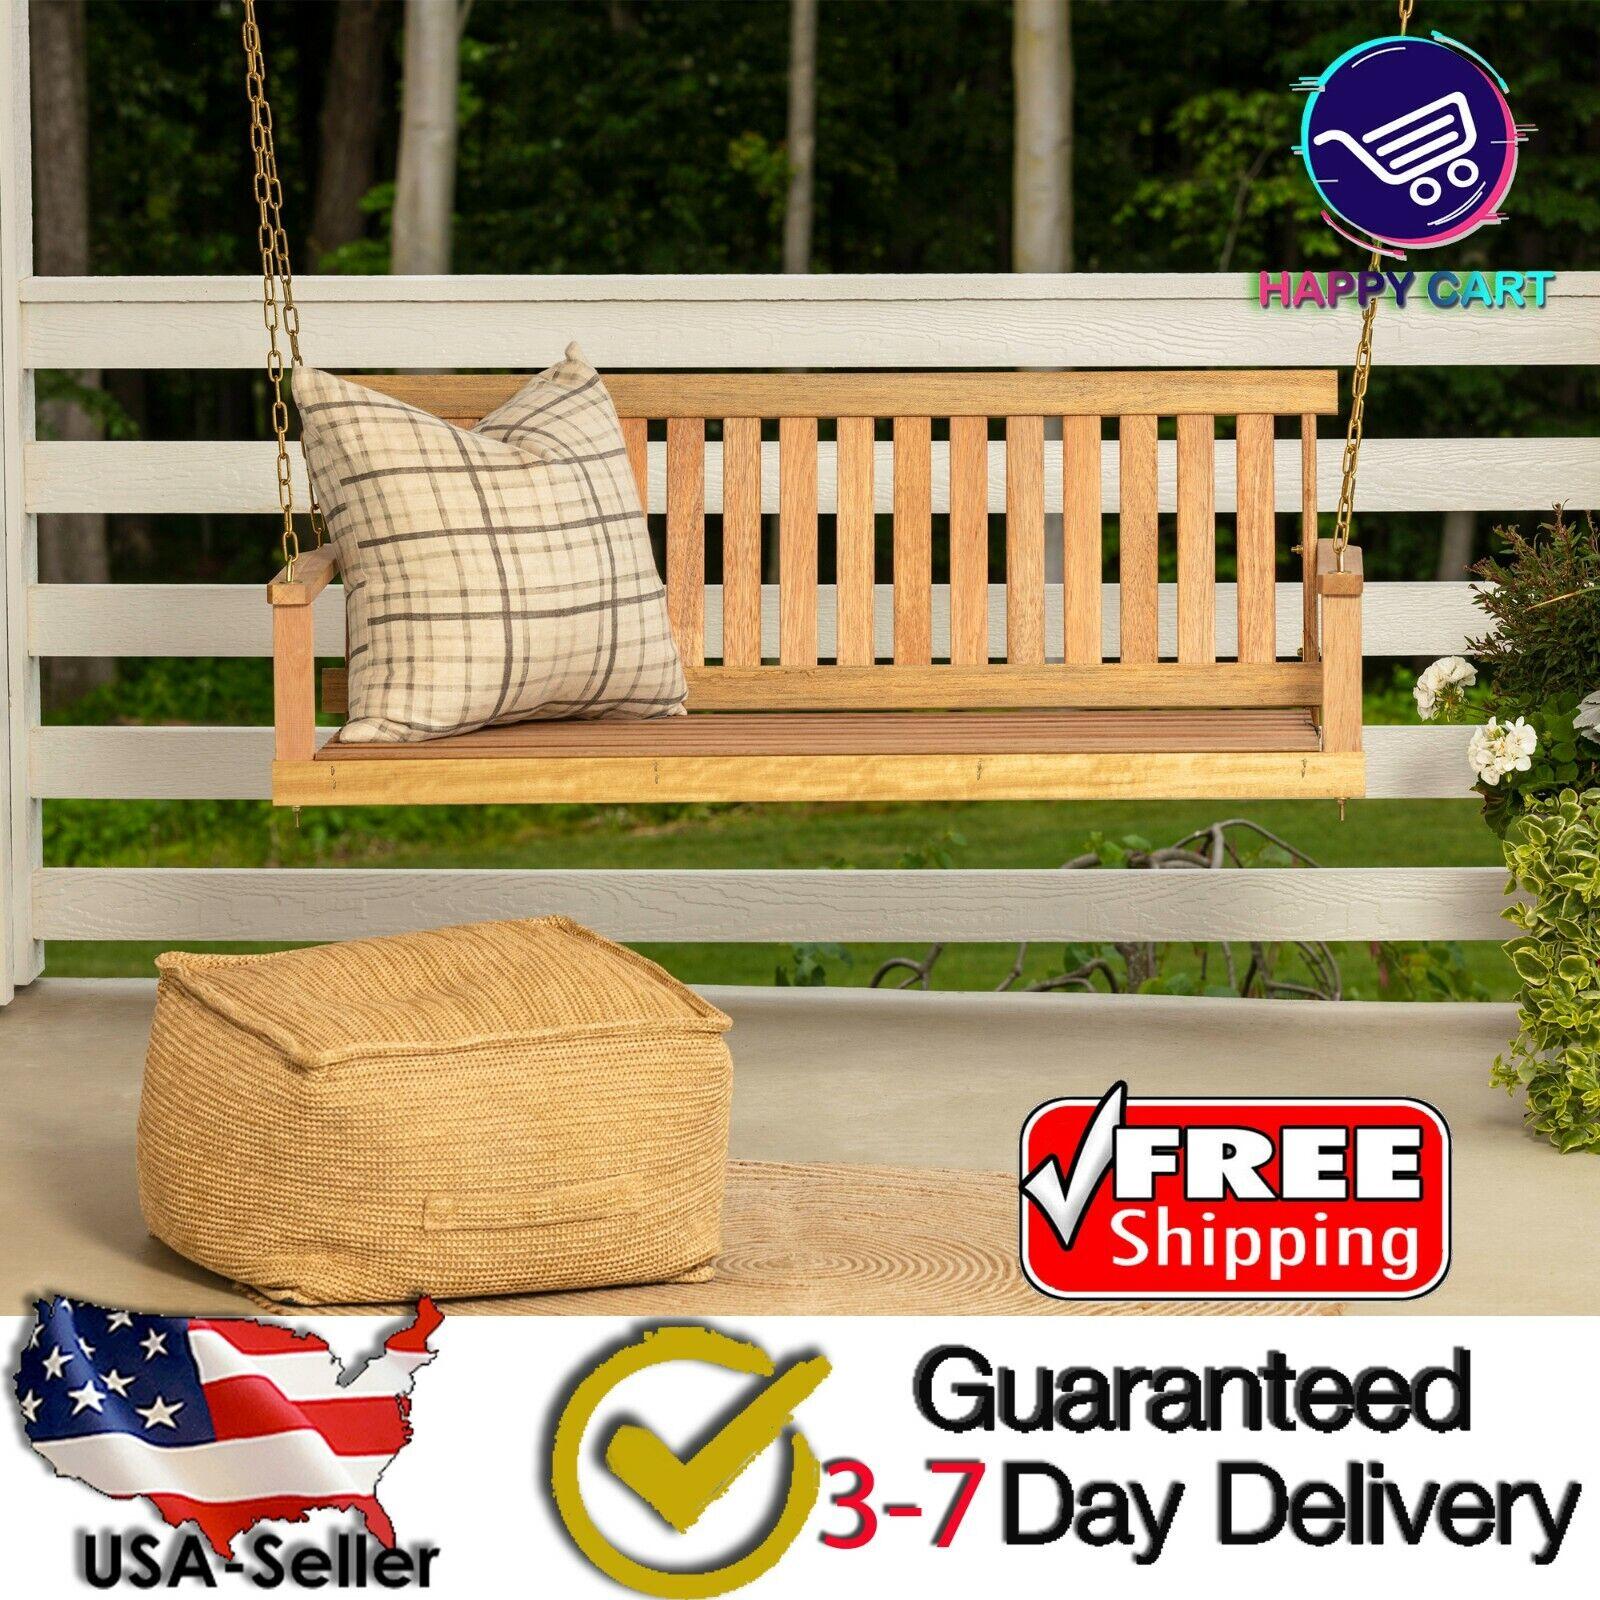 Wooden Porch Swing 4 Ft Natural Wood Patio Outdoor Yard Gard